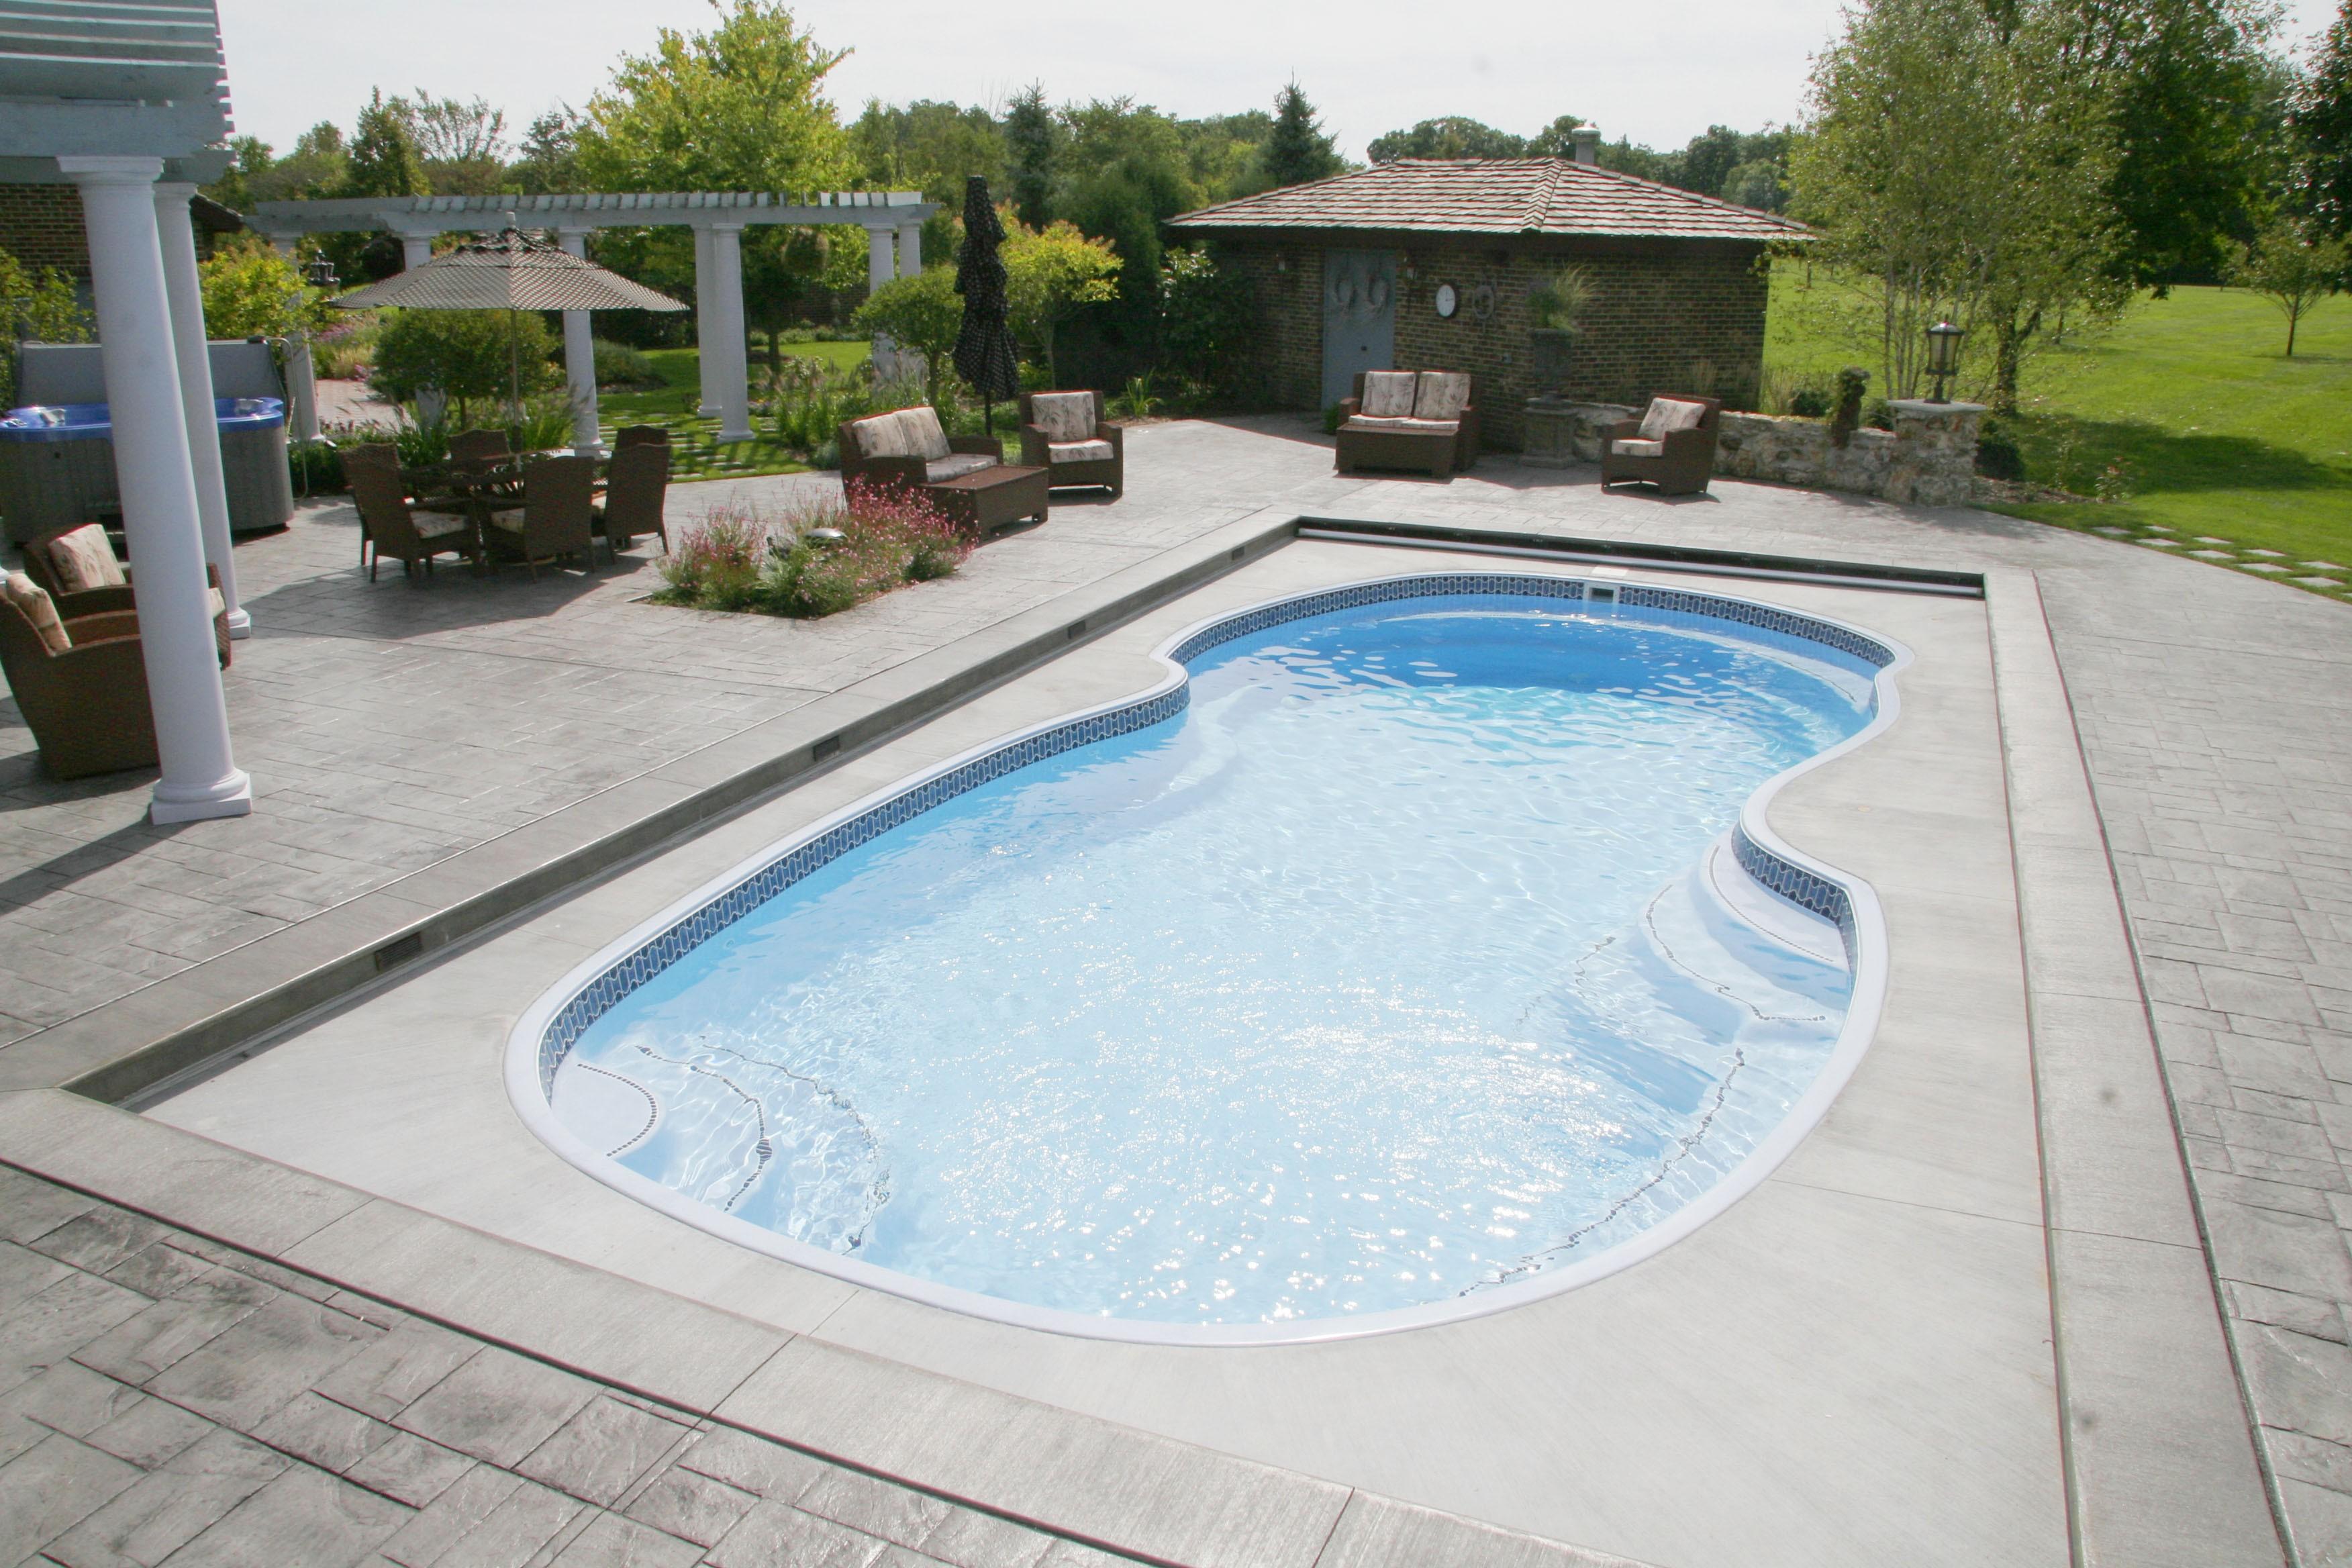 DesRochers Backyard Pools and Spas